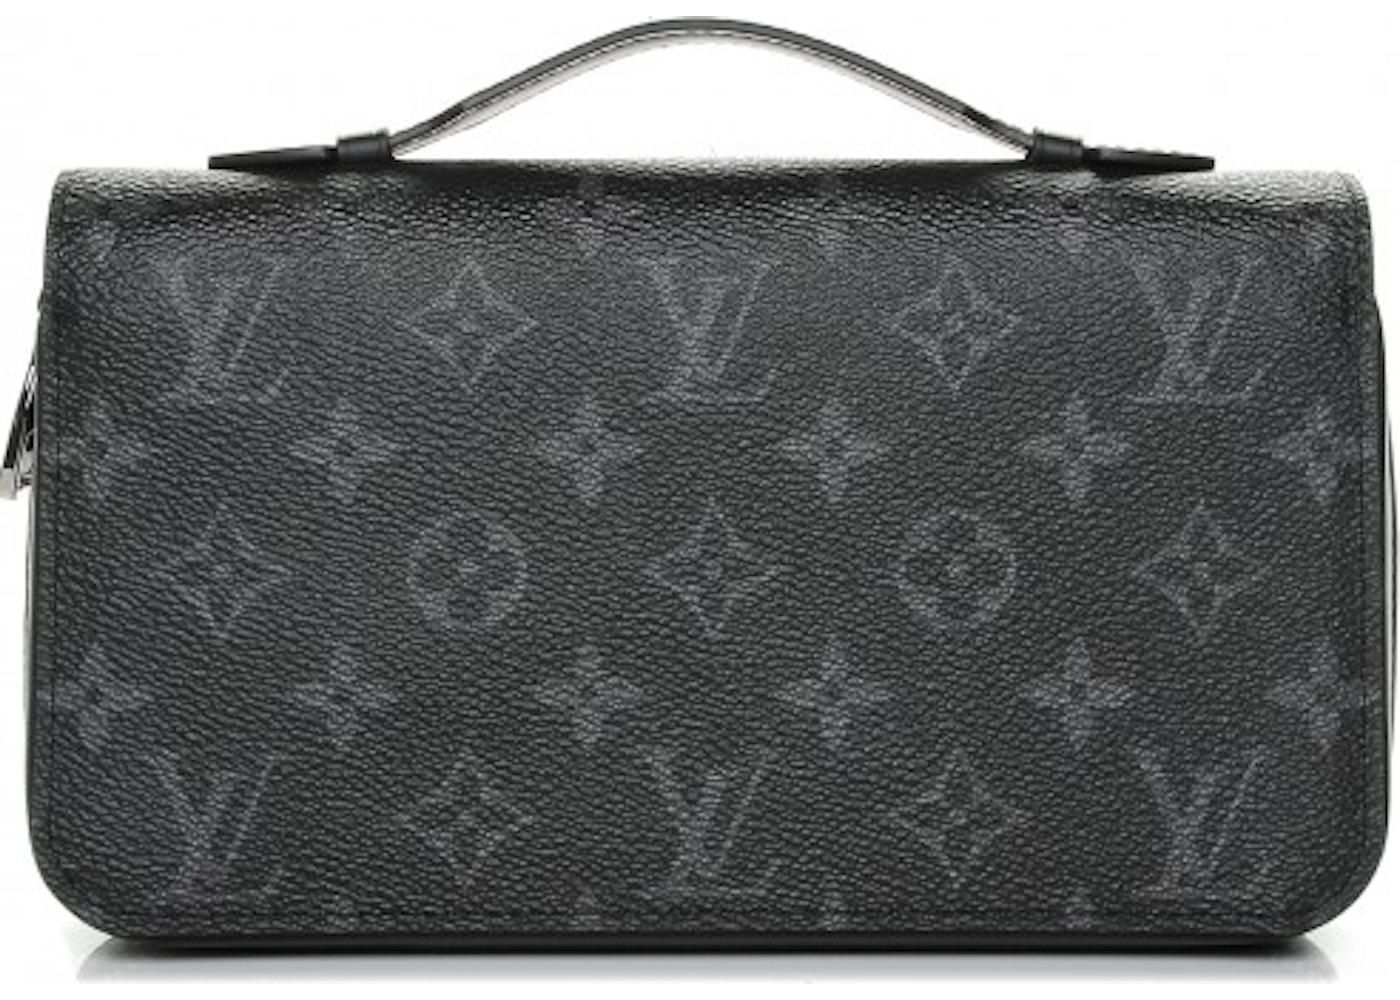 e6c99369ebb4 Louis Vuitton Zippy Wallet Monogram Eclipse XL